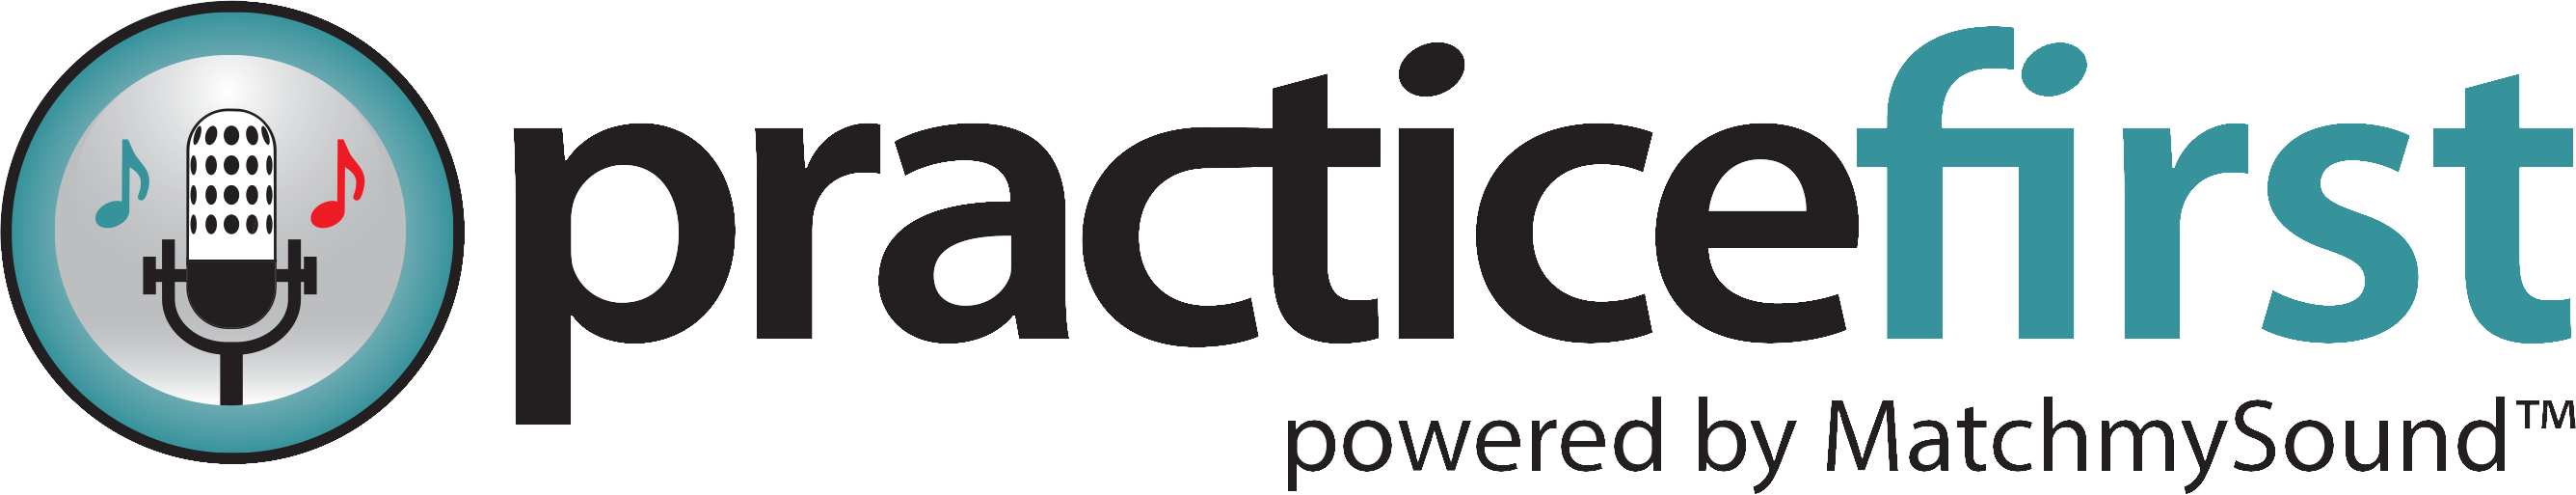 PracticeFirst Logo